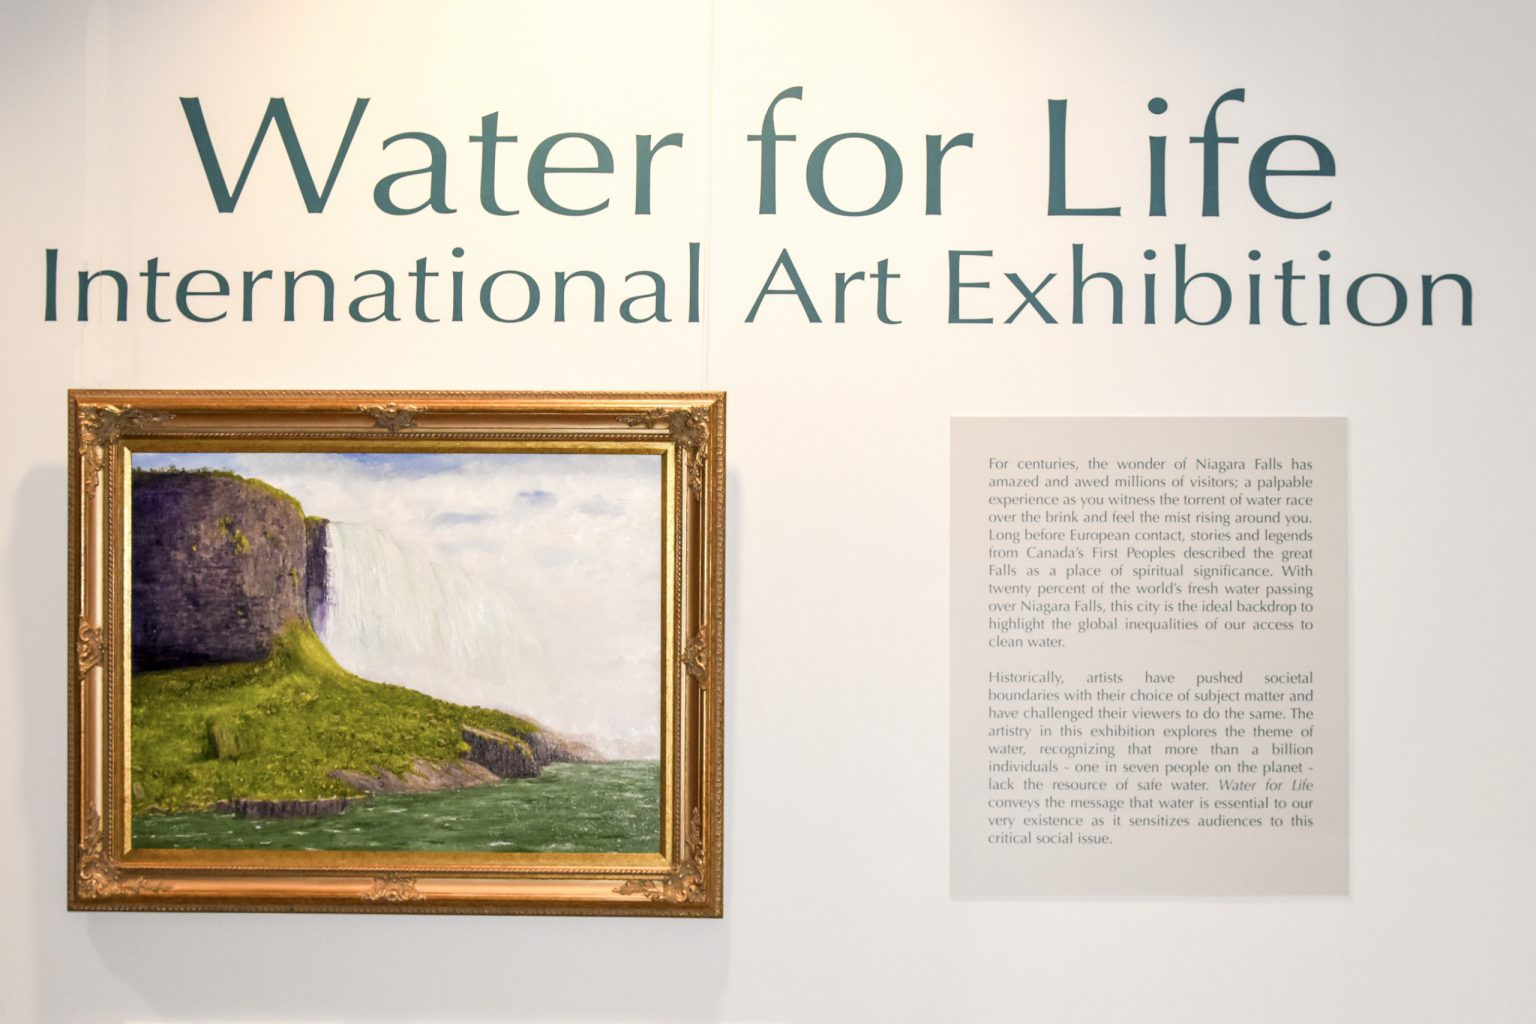 Water for Life, international Art Exhibition, First Edition, opening at the Niagara Falls History Museum, Niagara Falls.